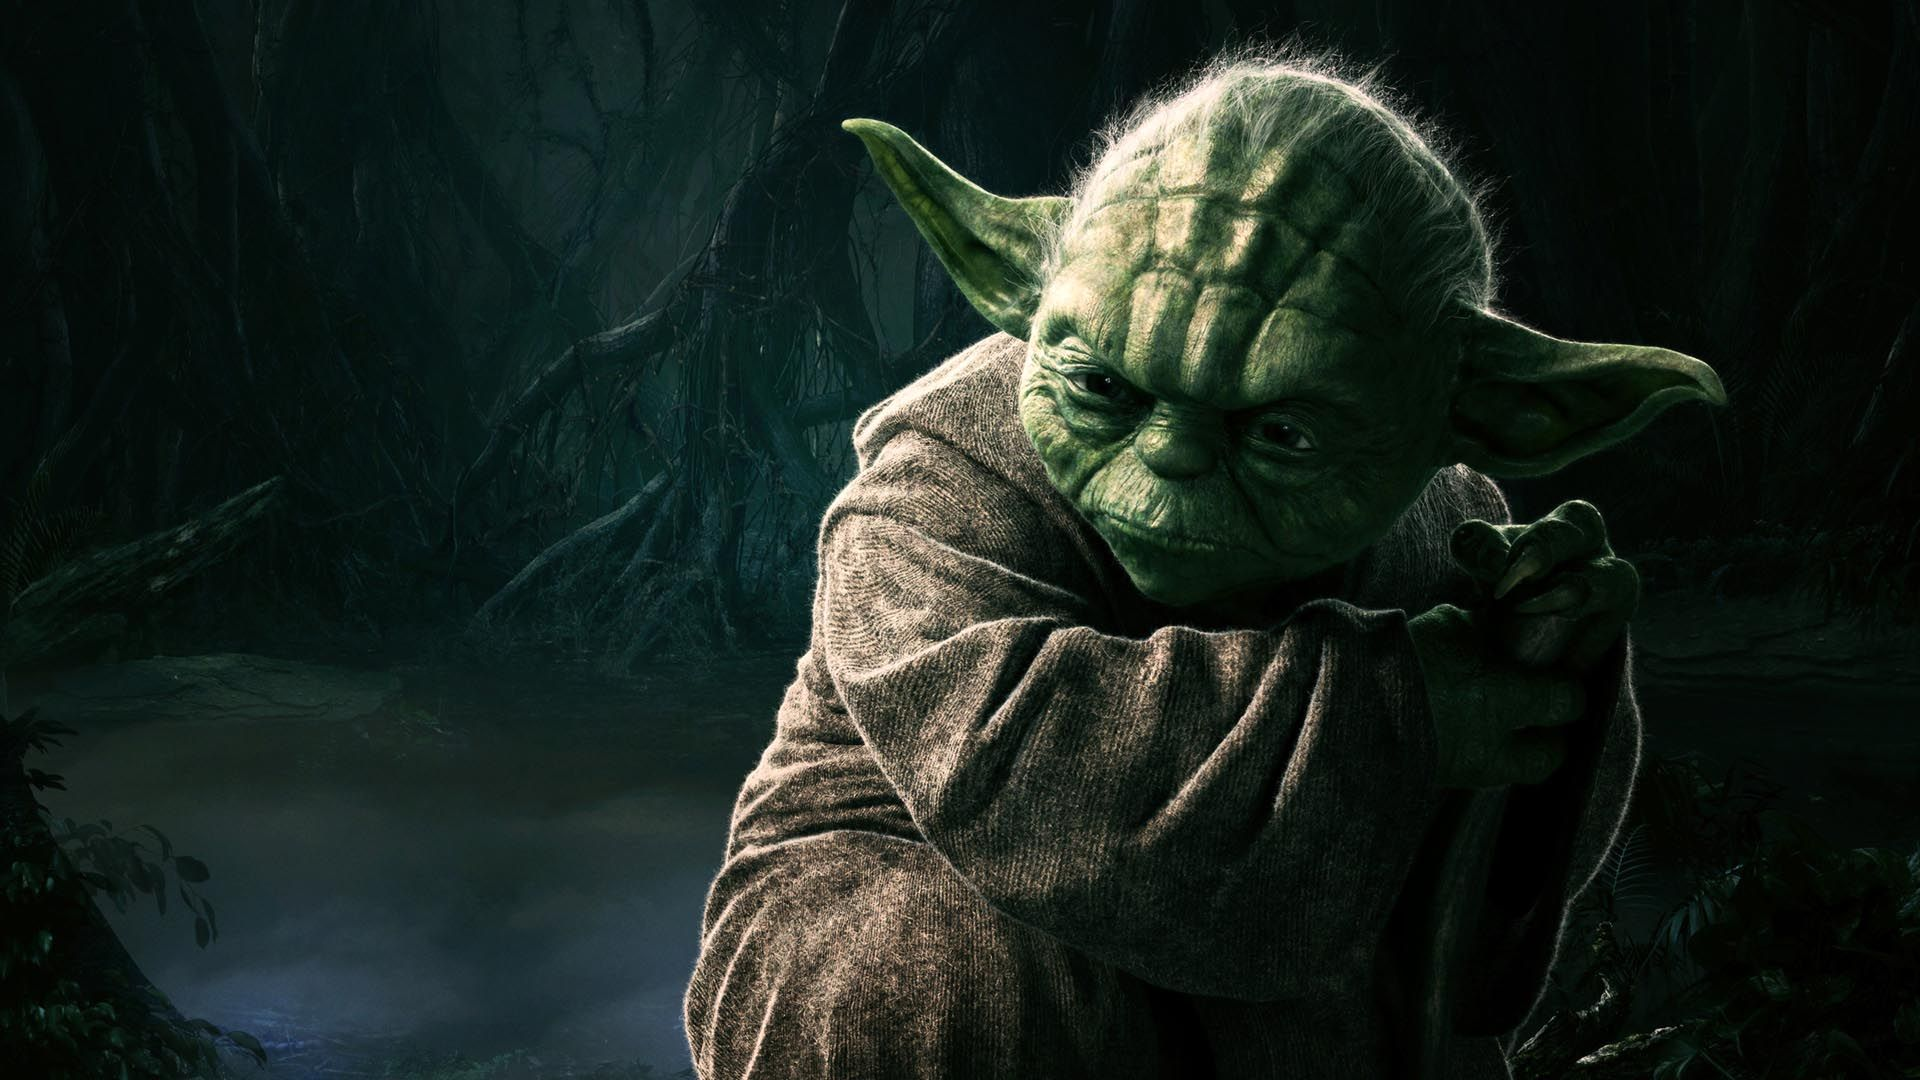 Star Wars Yoda Wallpapers Wallpaper Cave